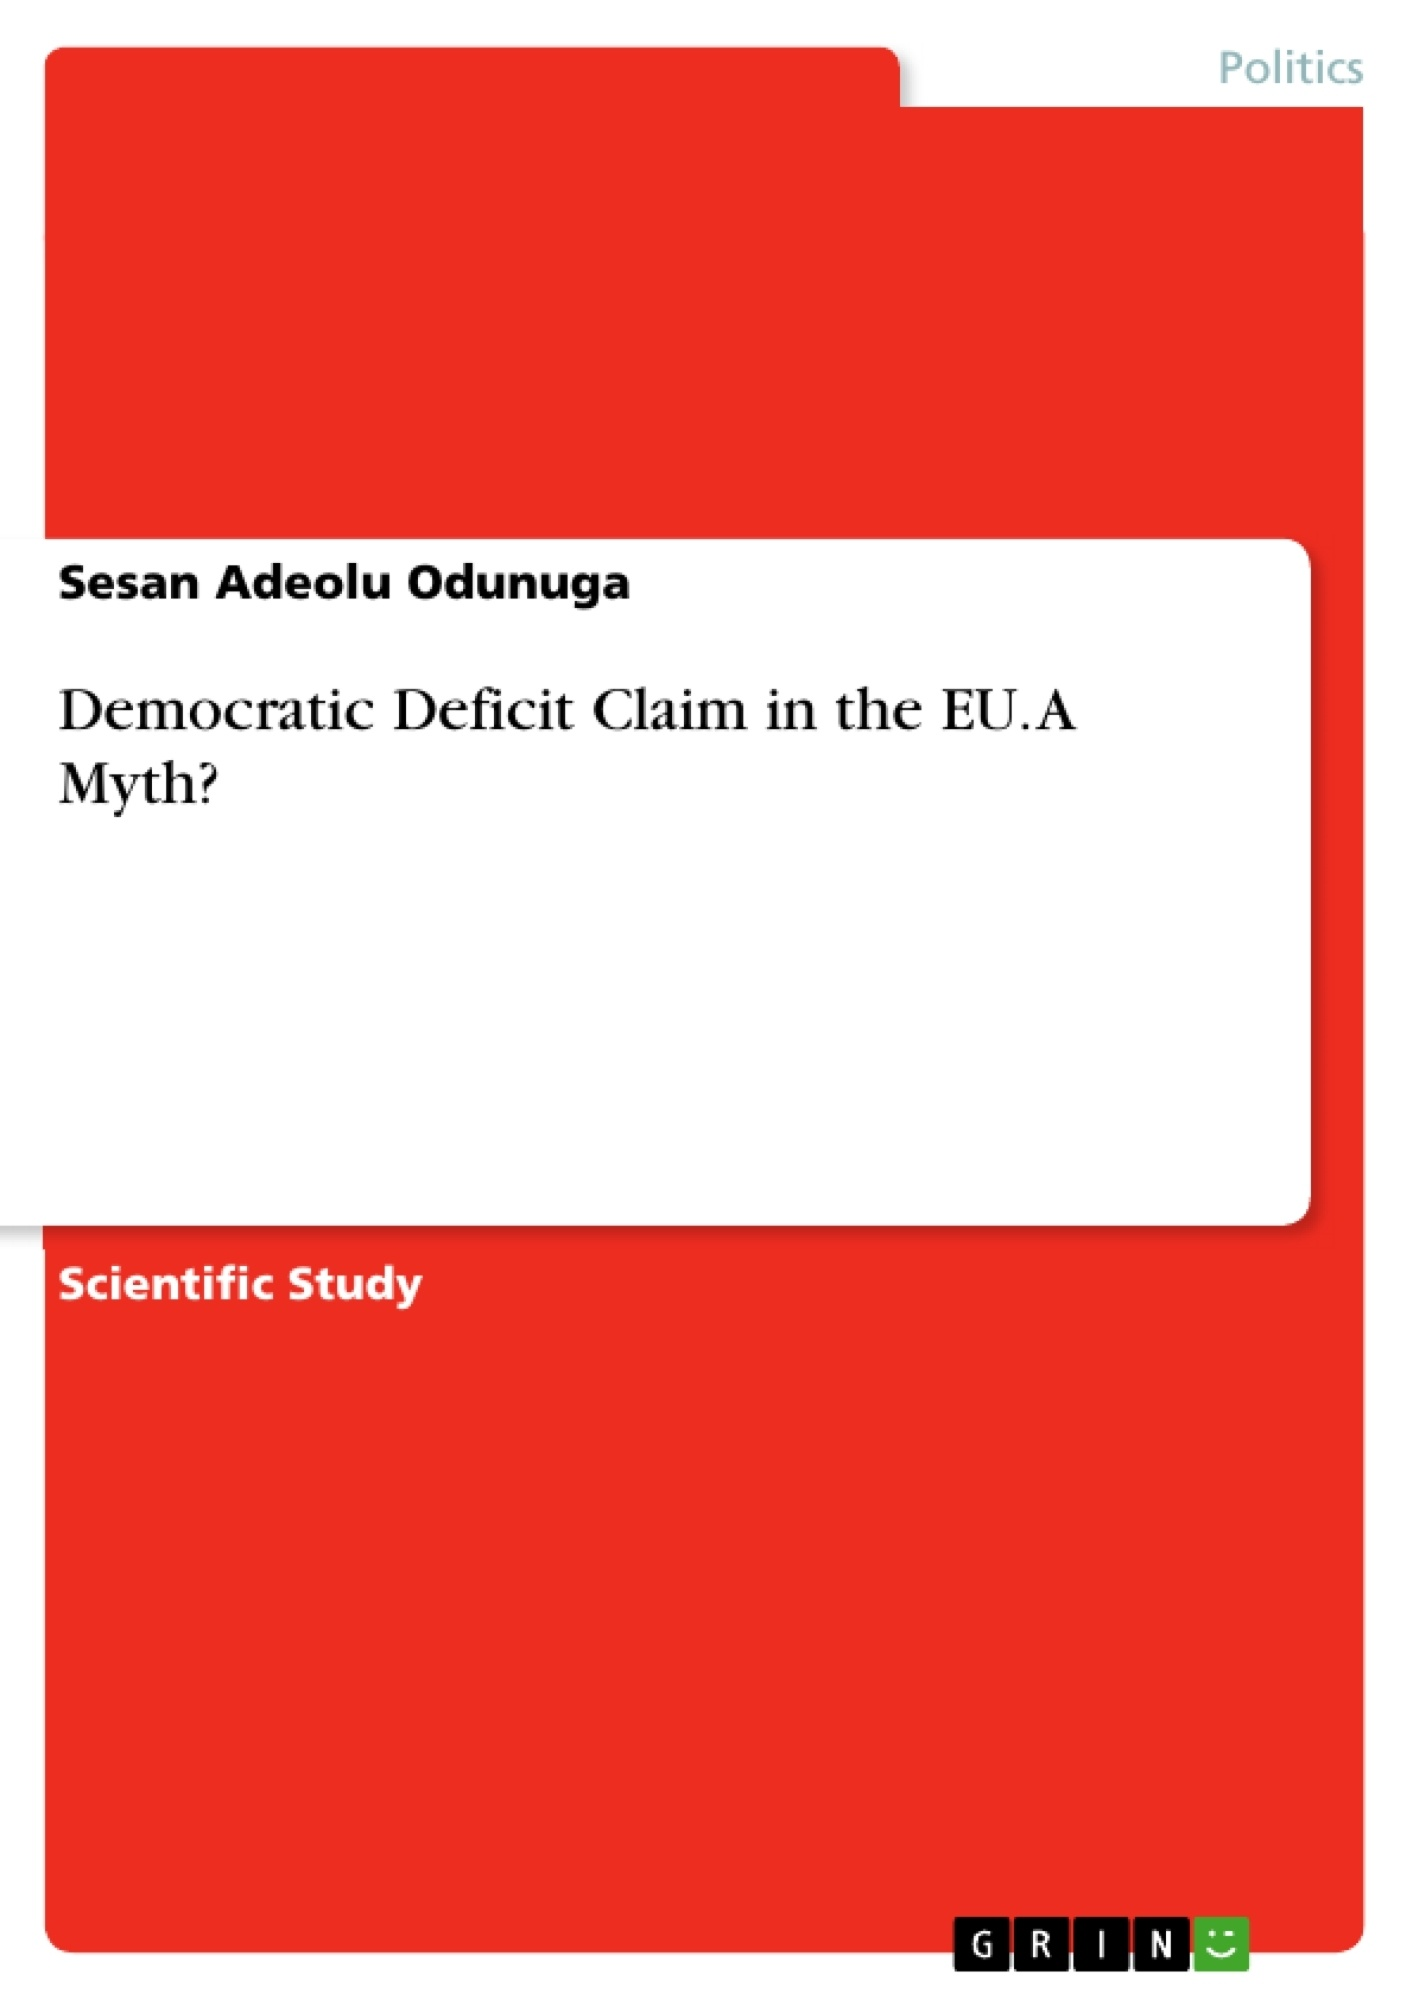 Title: Democratic Deficit Claim in the EU. A Myth?